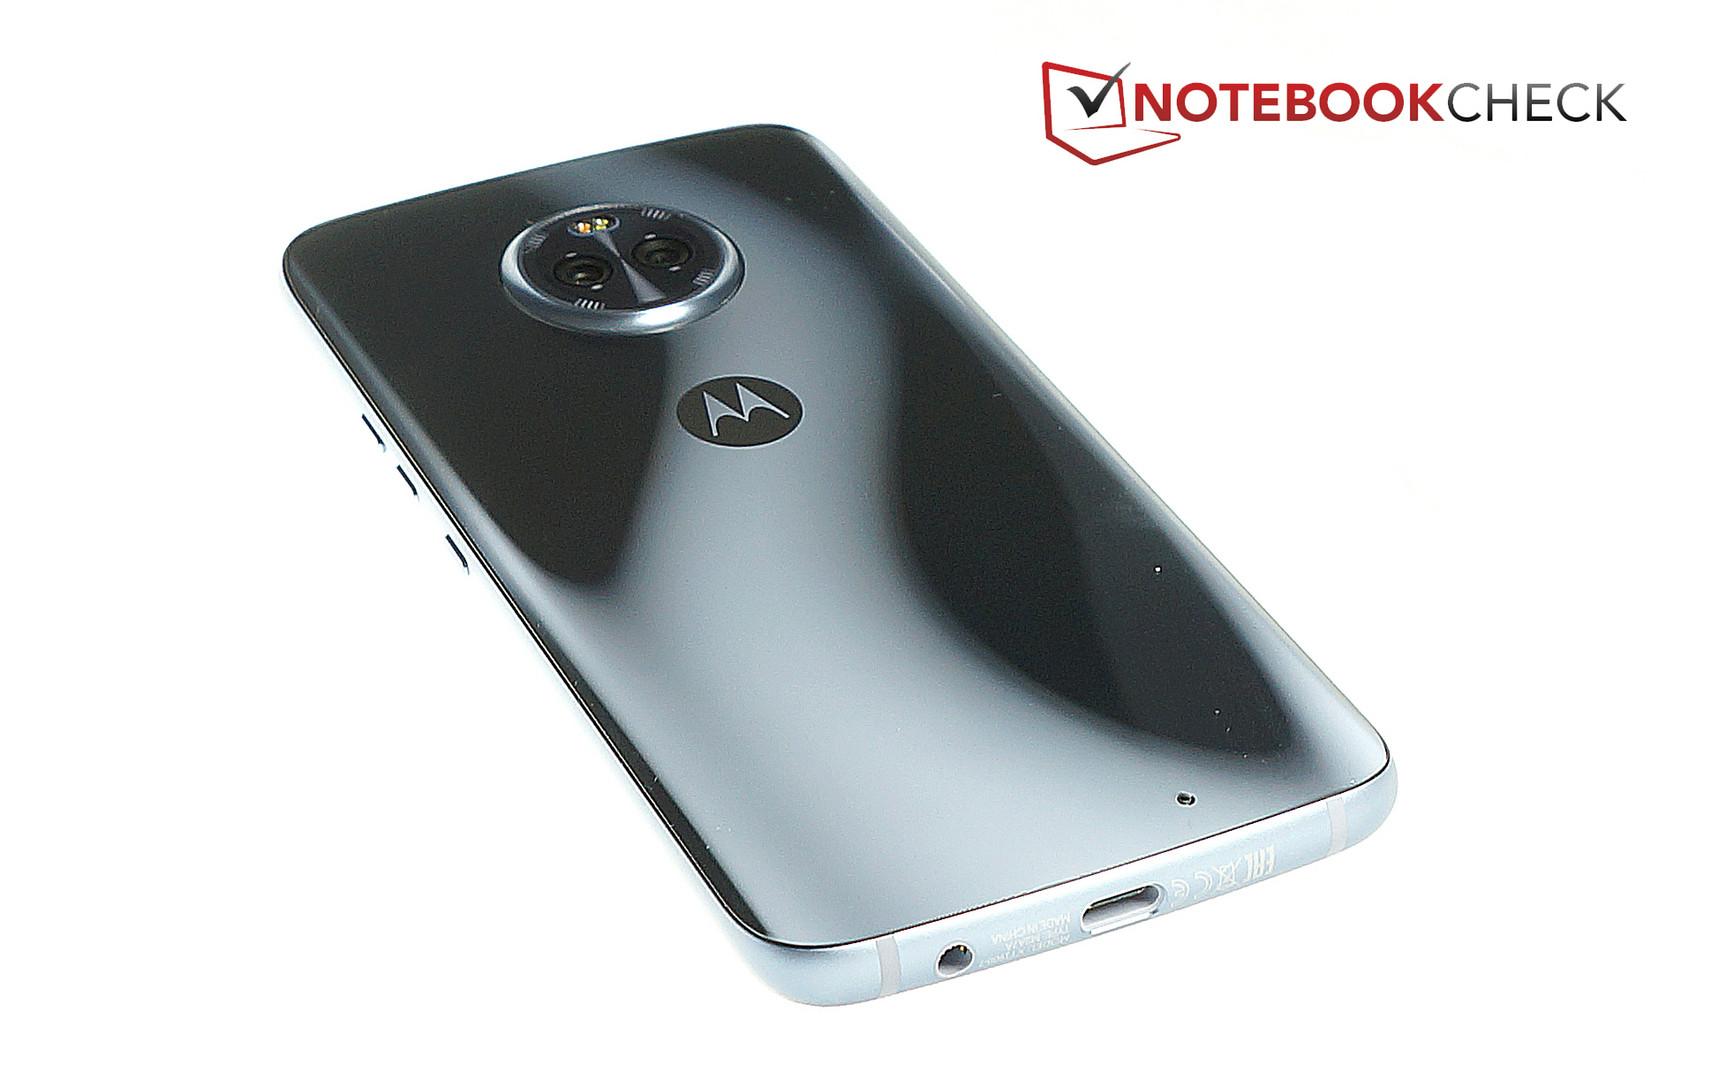 Test Motorola Moto X4 Smartphone - Notebookcheck.com Tests